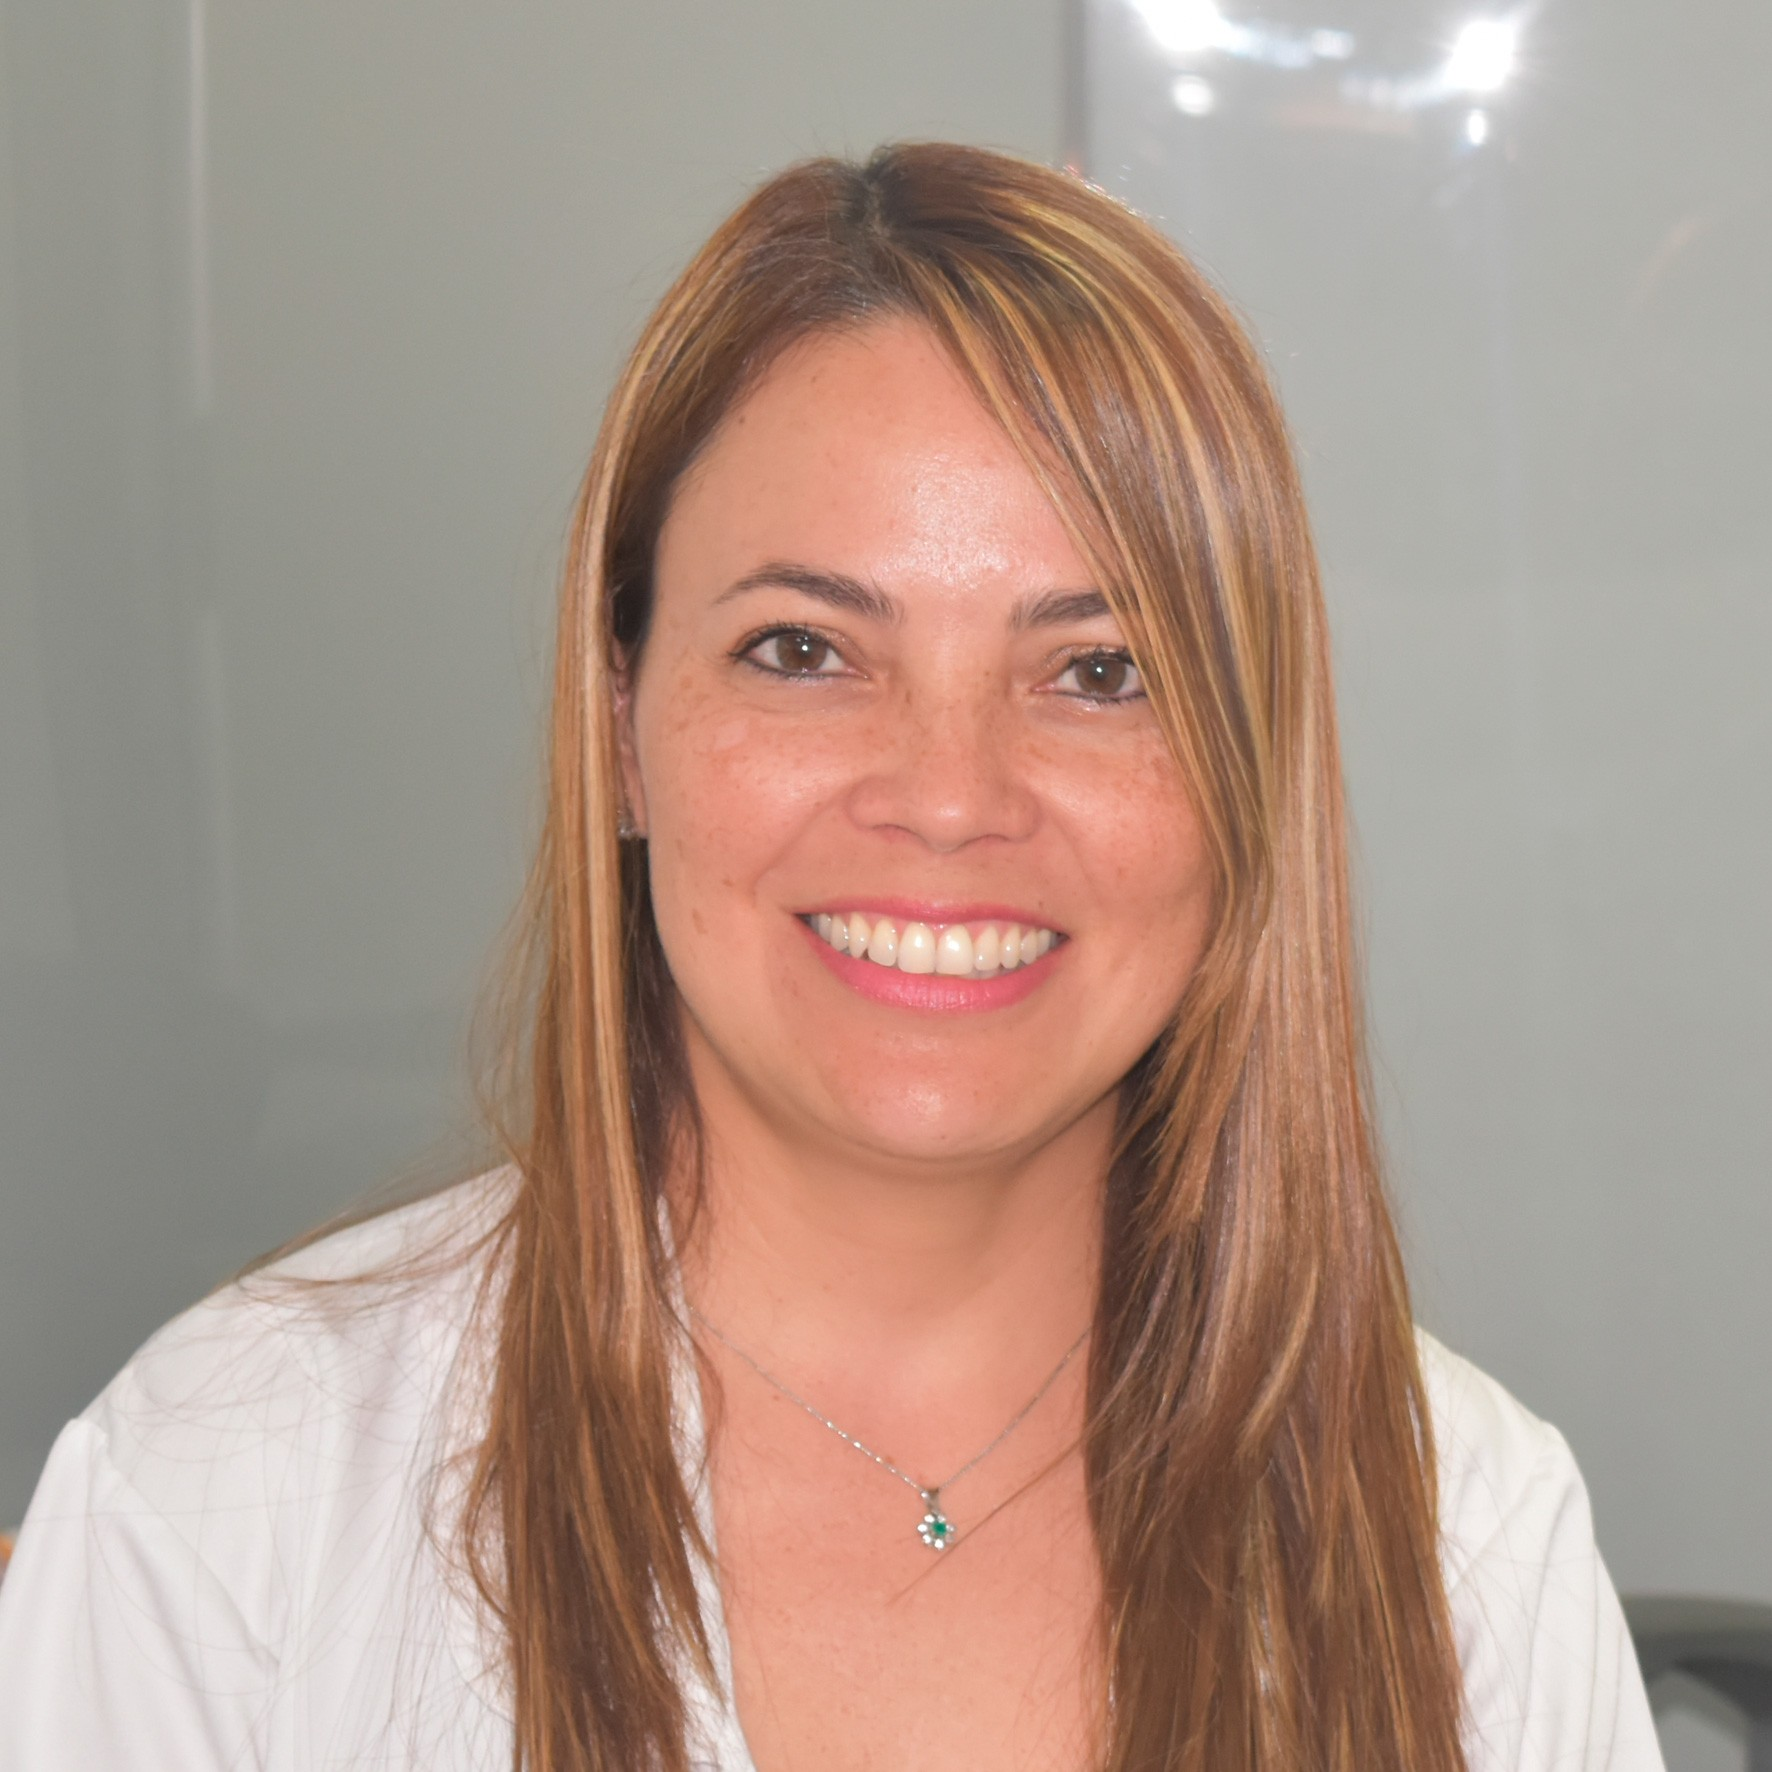 Liliana Marcela Cepeda Mejía